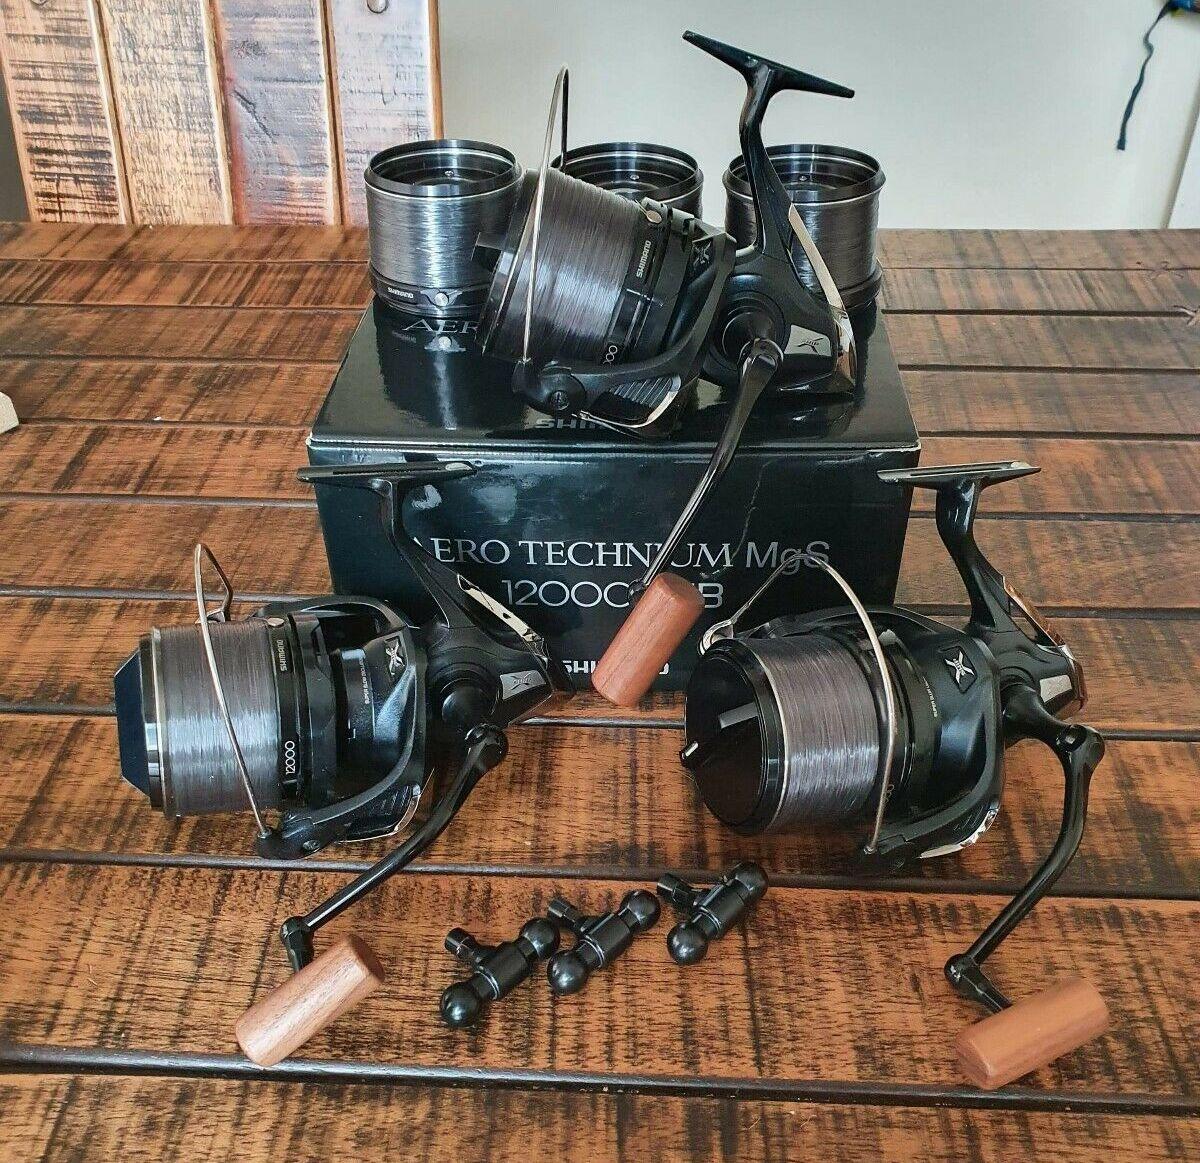 Ad - Shimano Aero Technium 12000 XTB MgS Carp Fishing Reels On eBay here -->> https://t.co/3cy